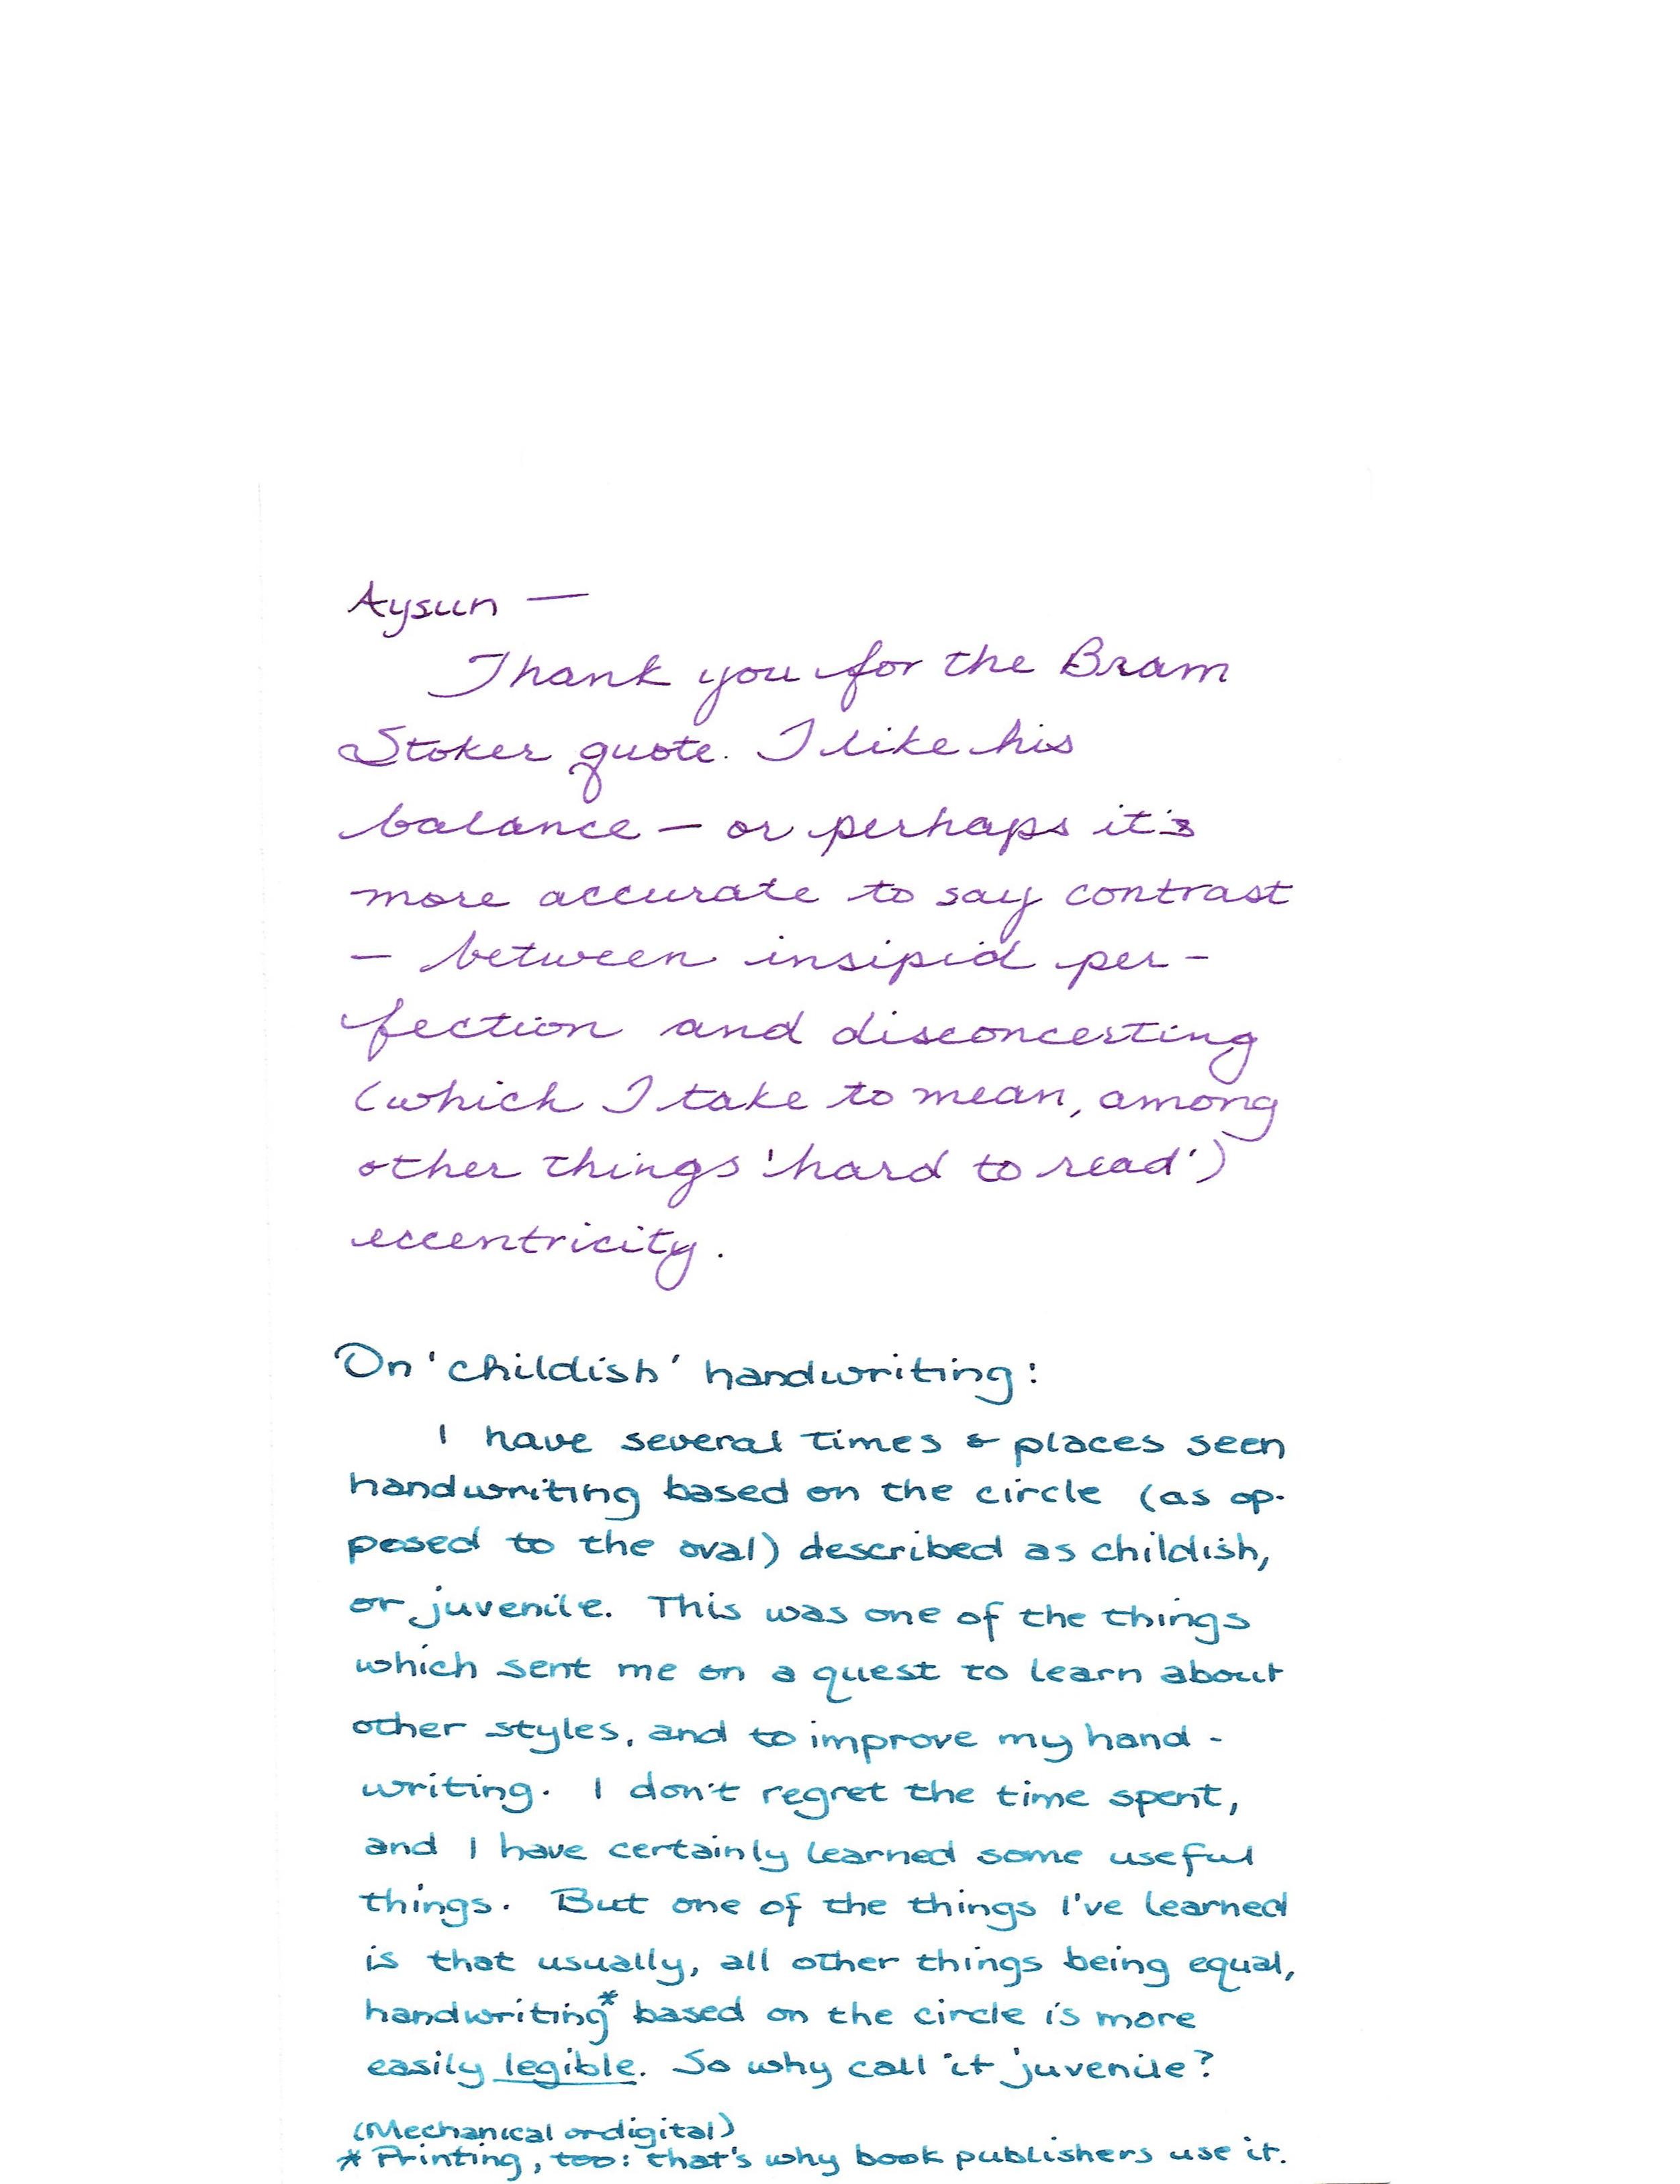 fpn_1524511439__23apr18_on_handwriting.j